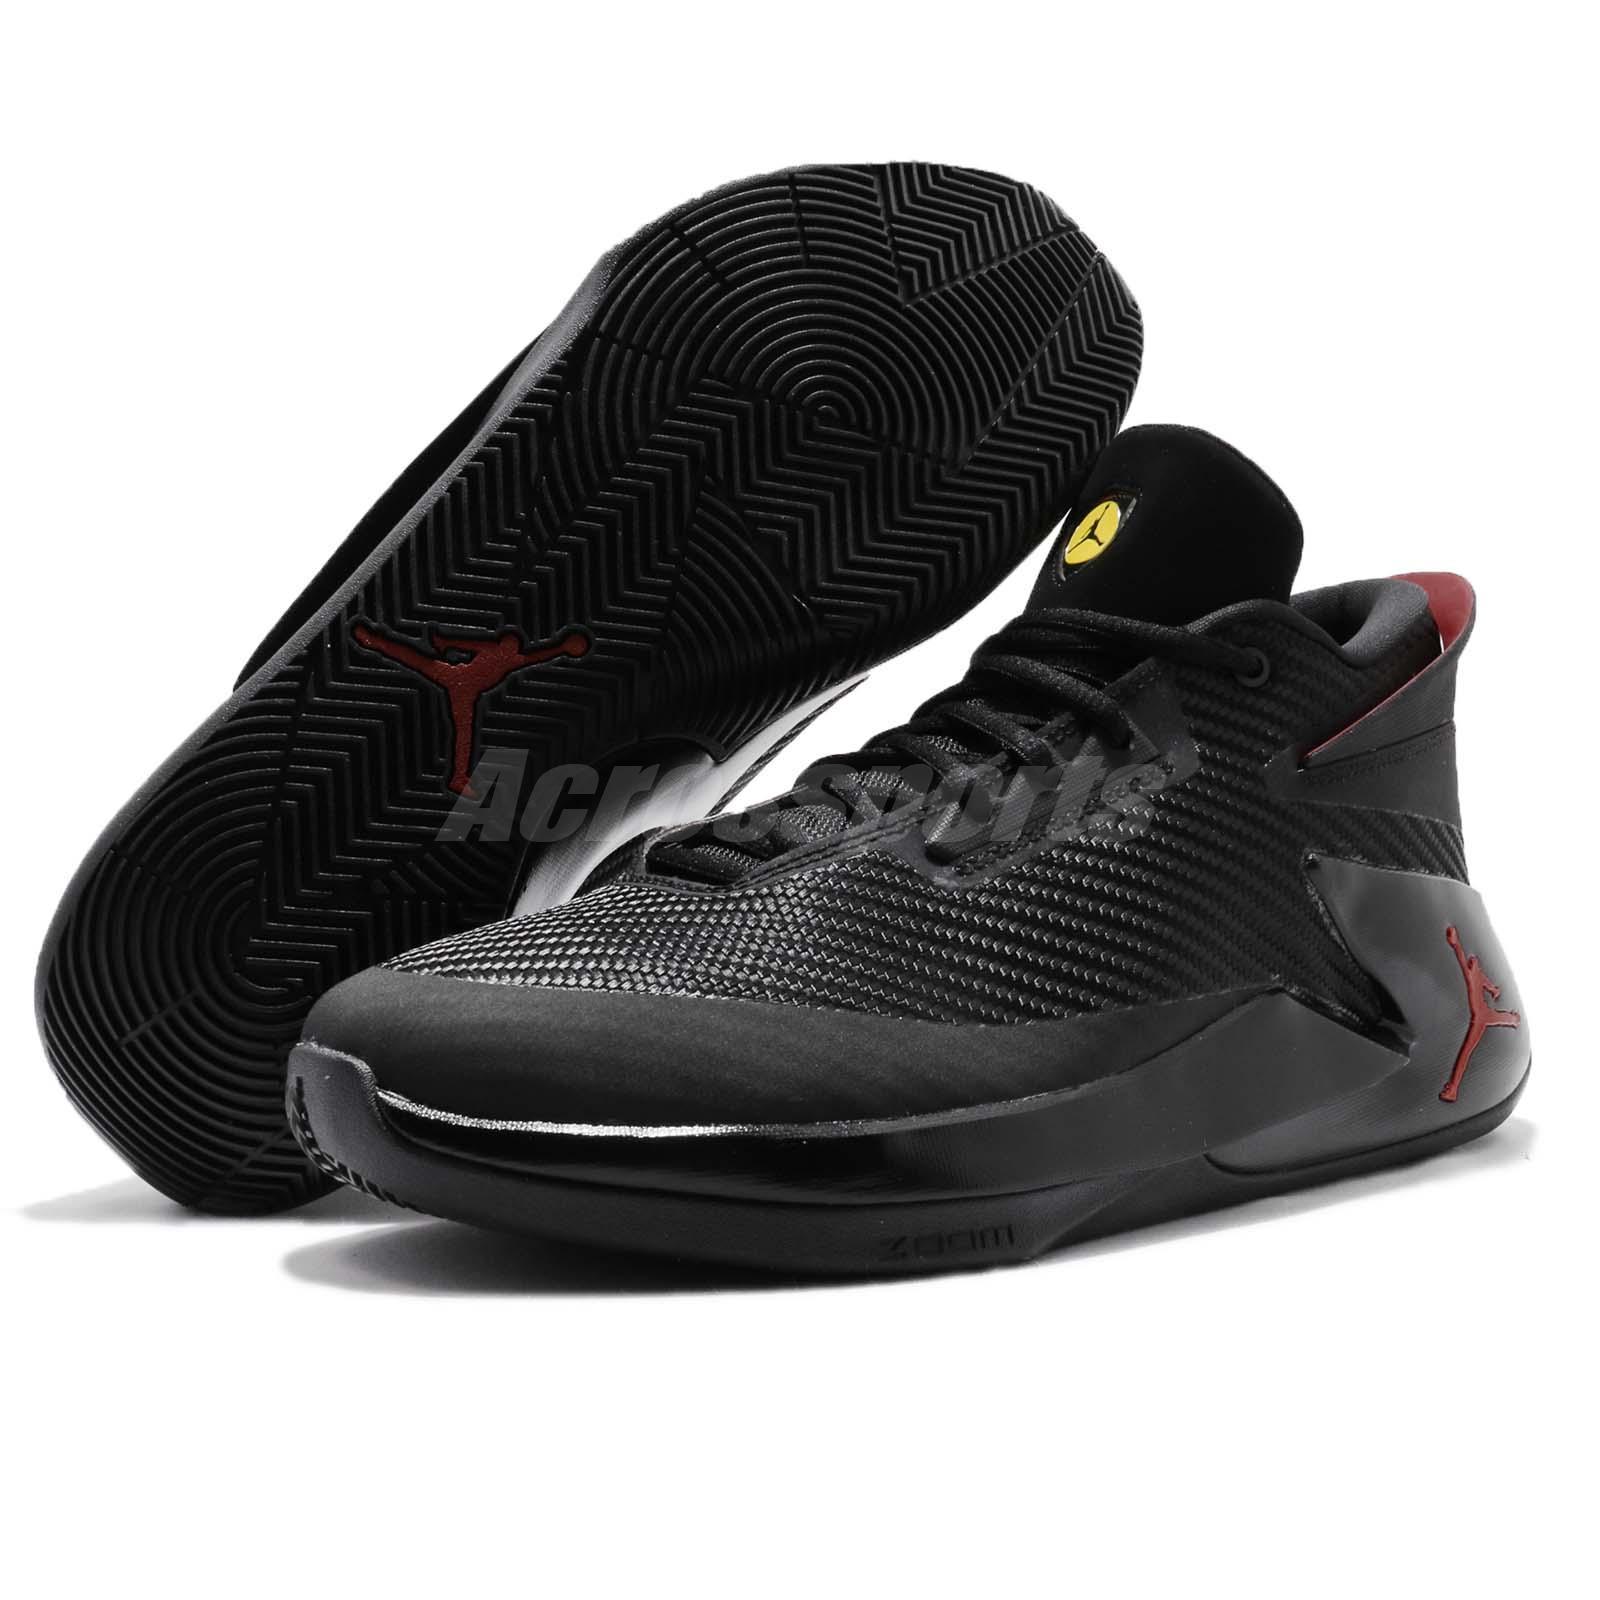 b65c2ce6635a Nike Jordan Fly Lockdown PFX Last Shot Black Red Men Basketball ...